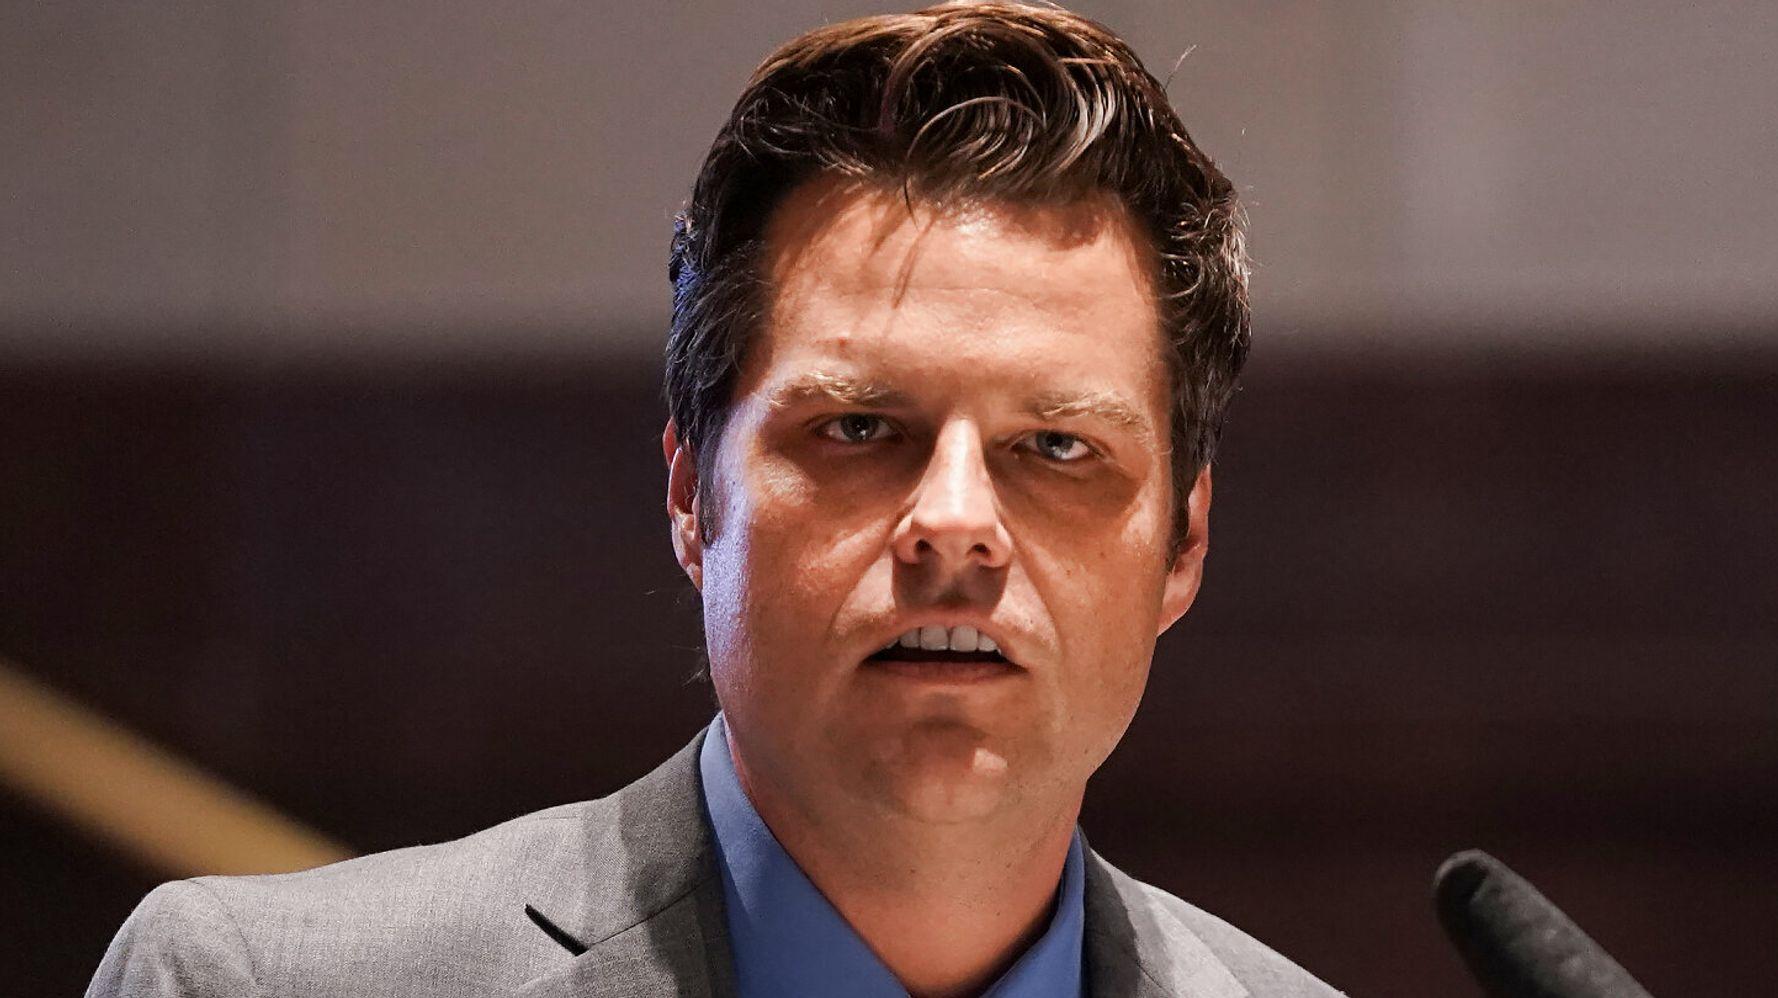 New Matt Gaetz Bombshell Report Alleges Drugs, Sex, Money... And Receipts